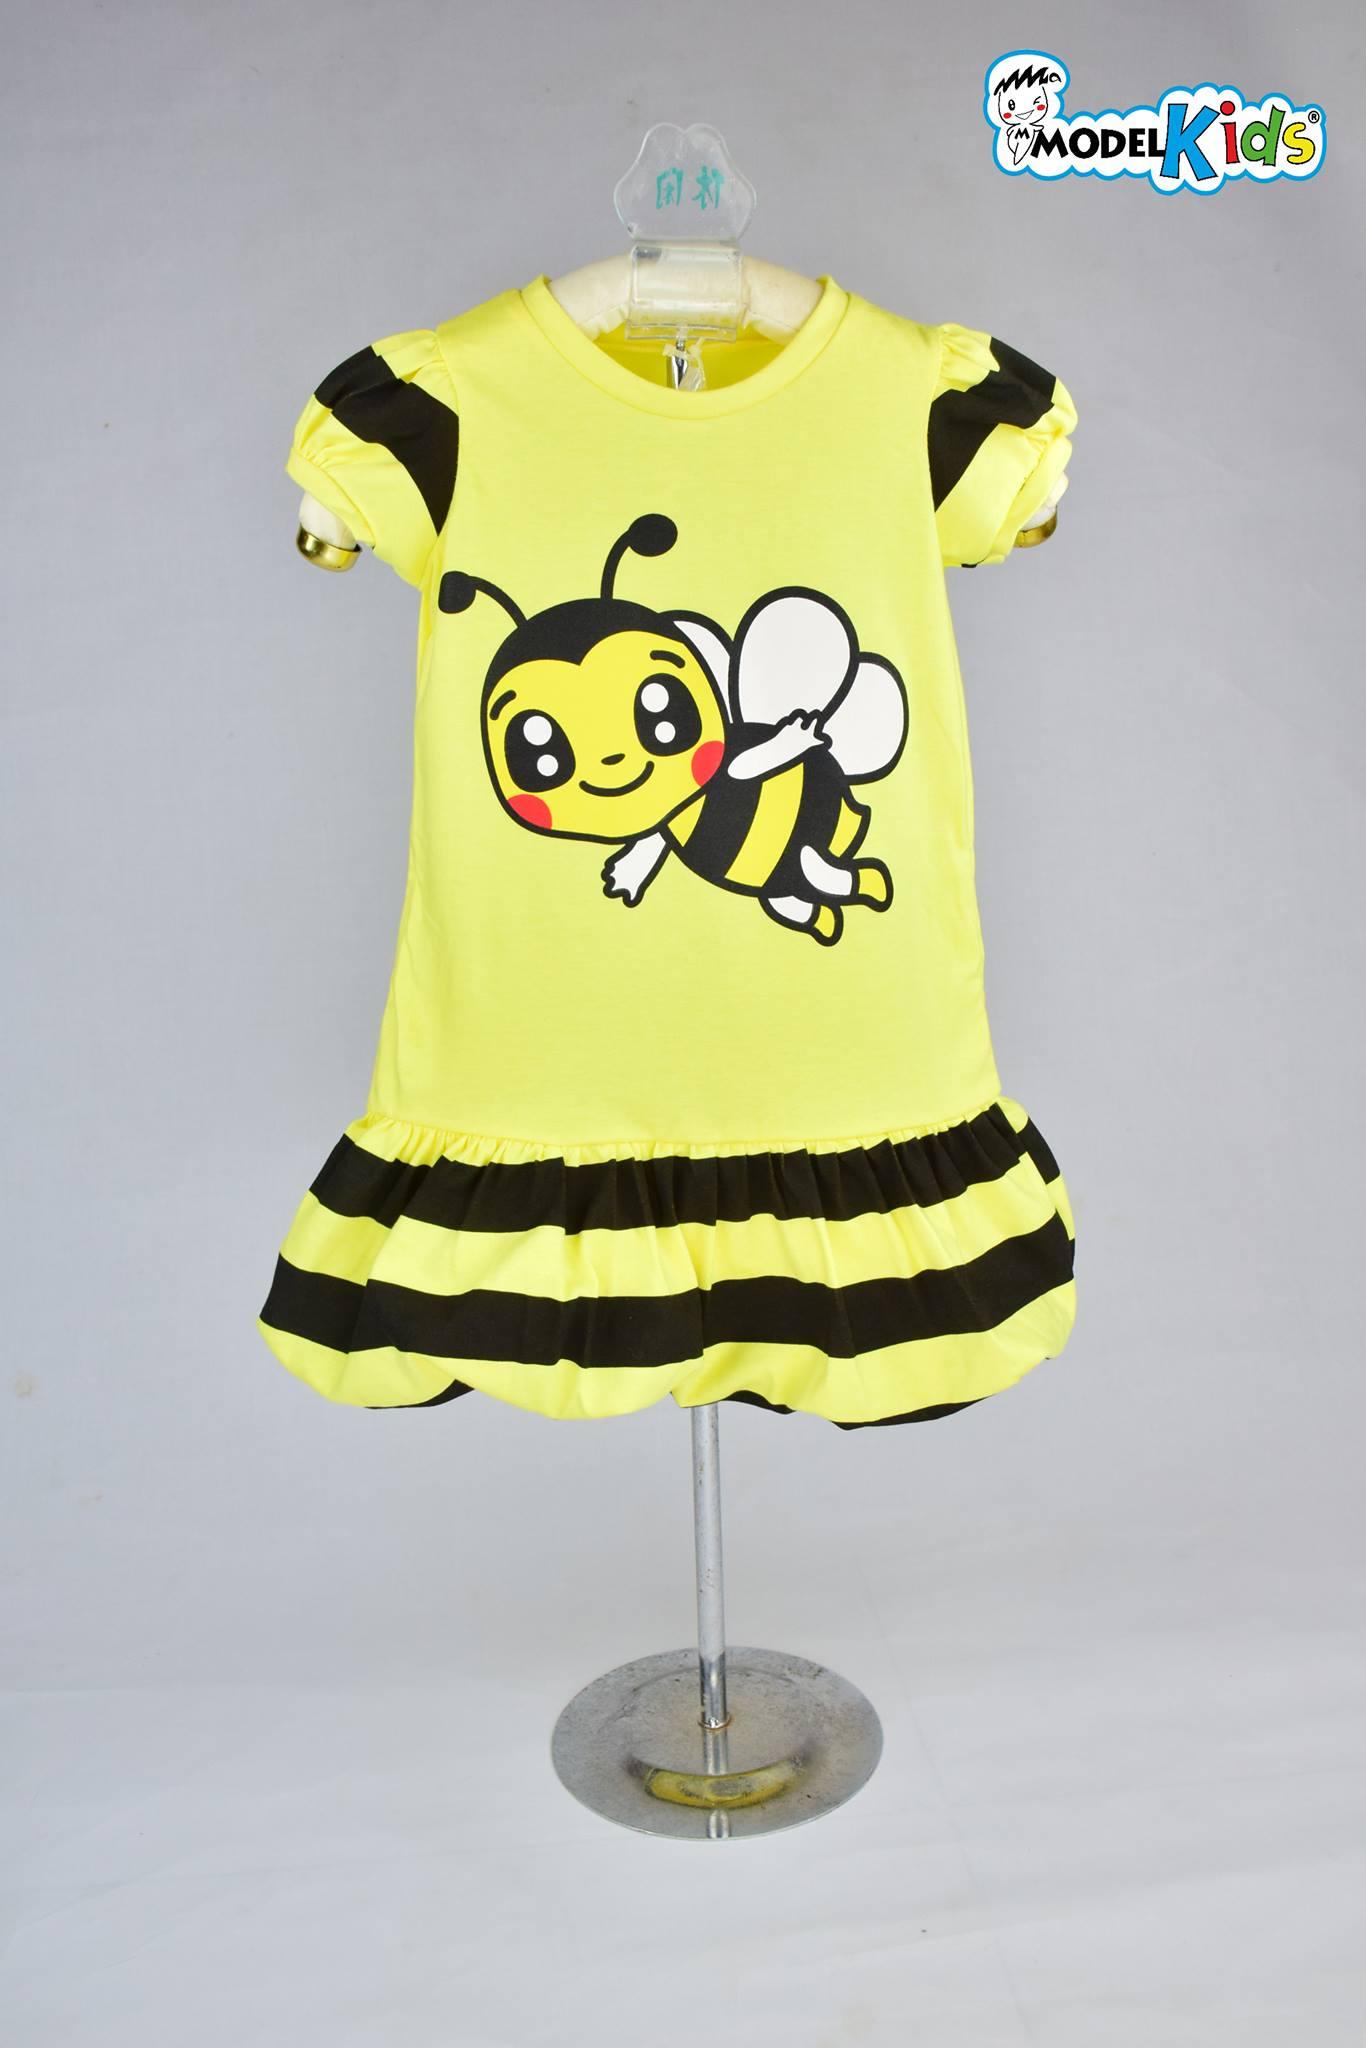 Balloon Dress ผึ้งเหลือง